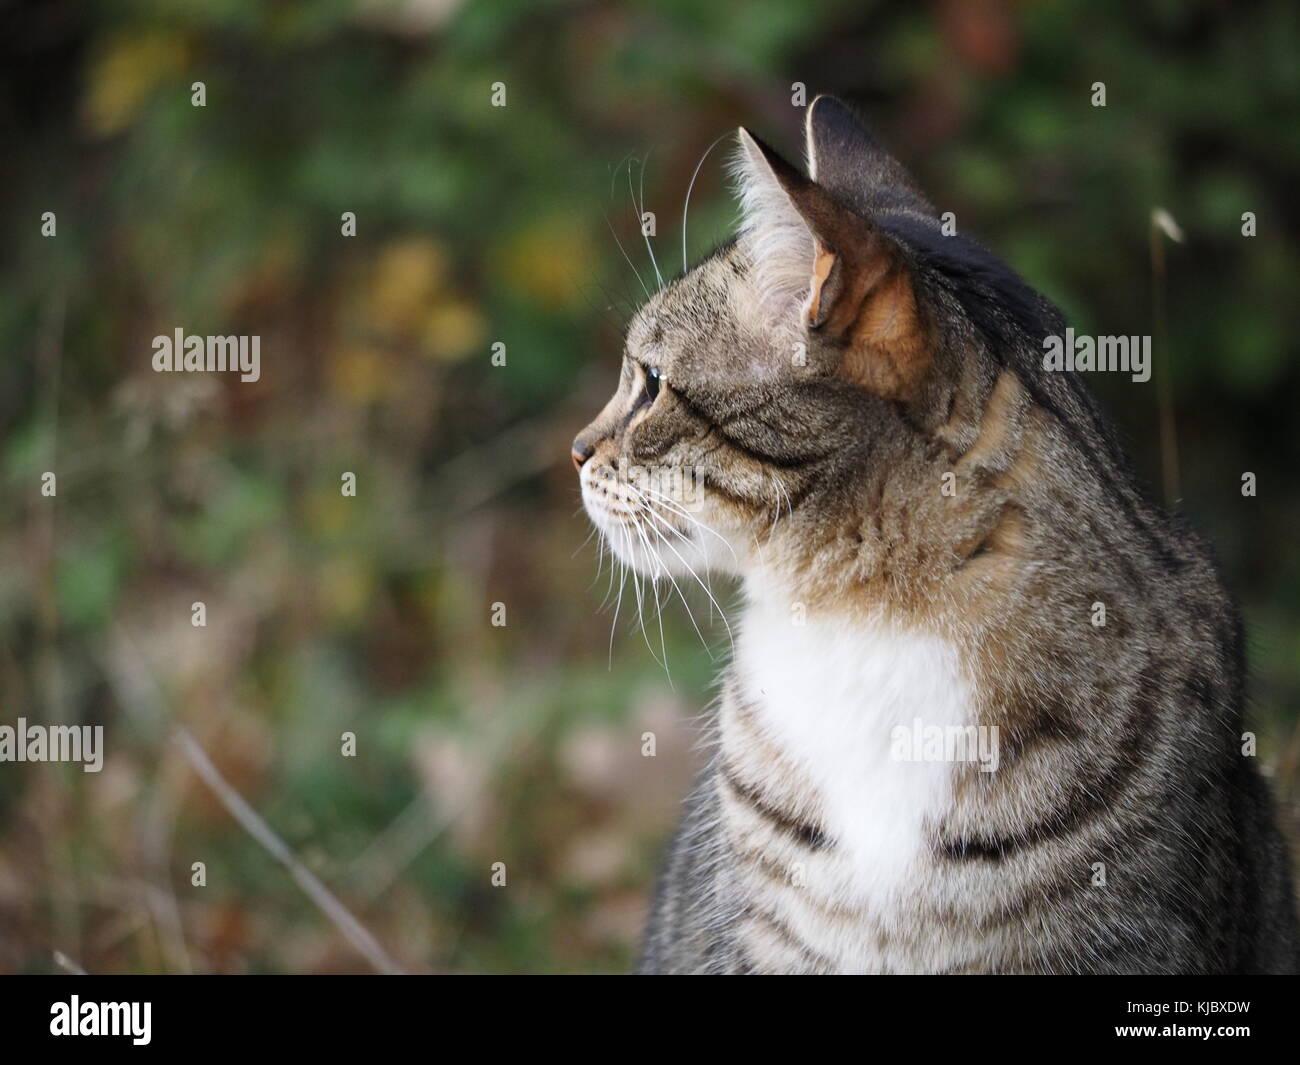 Cat in garden looking into distance - Stock Image